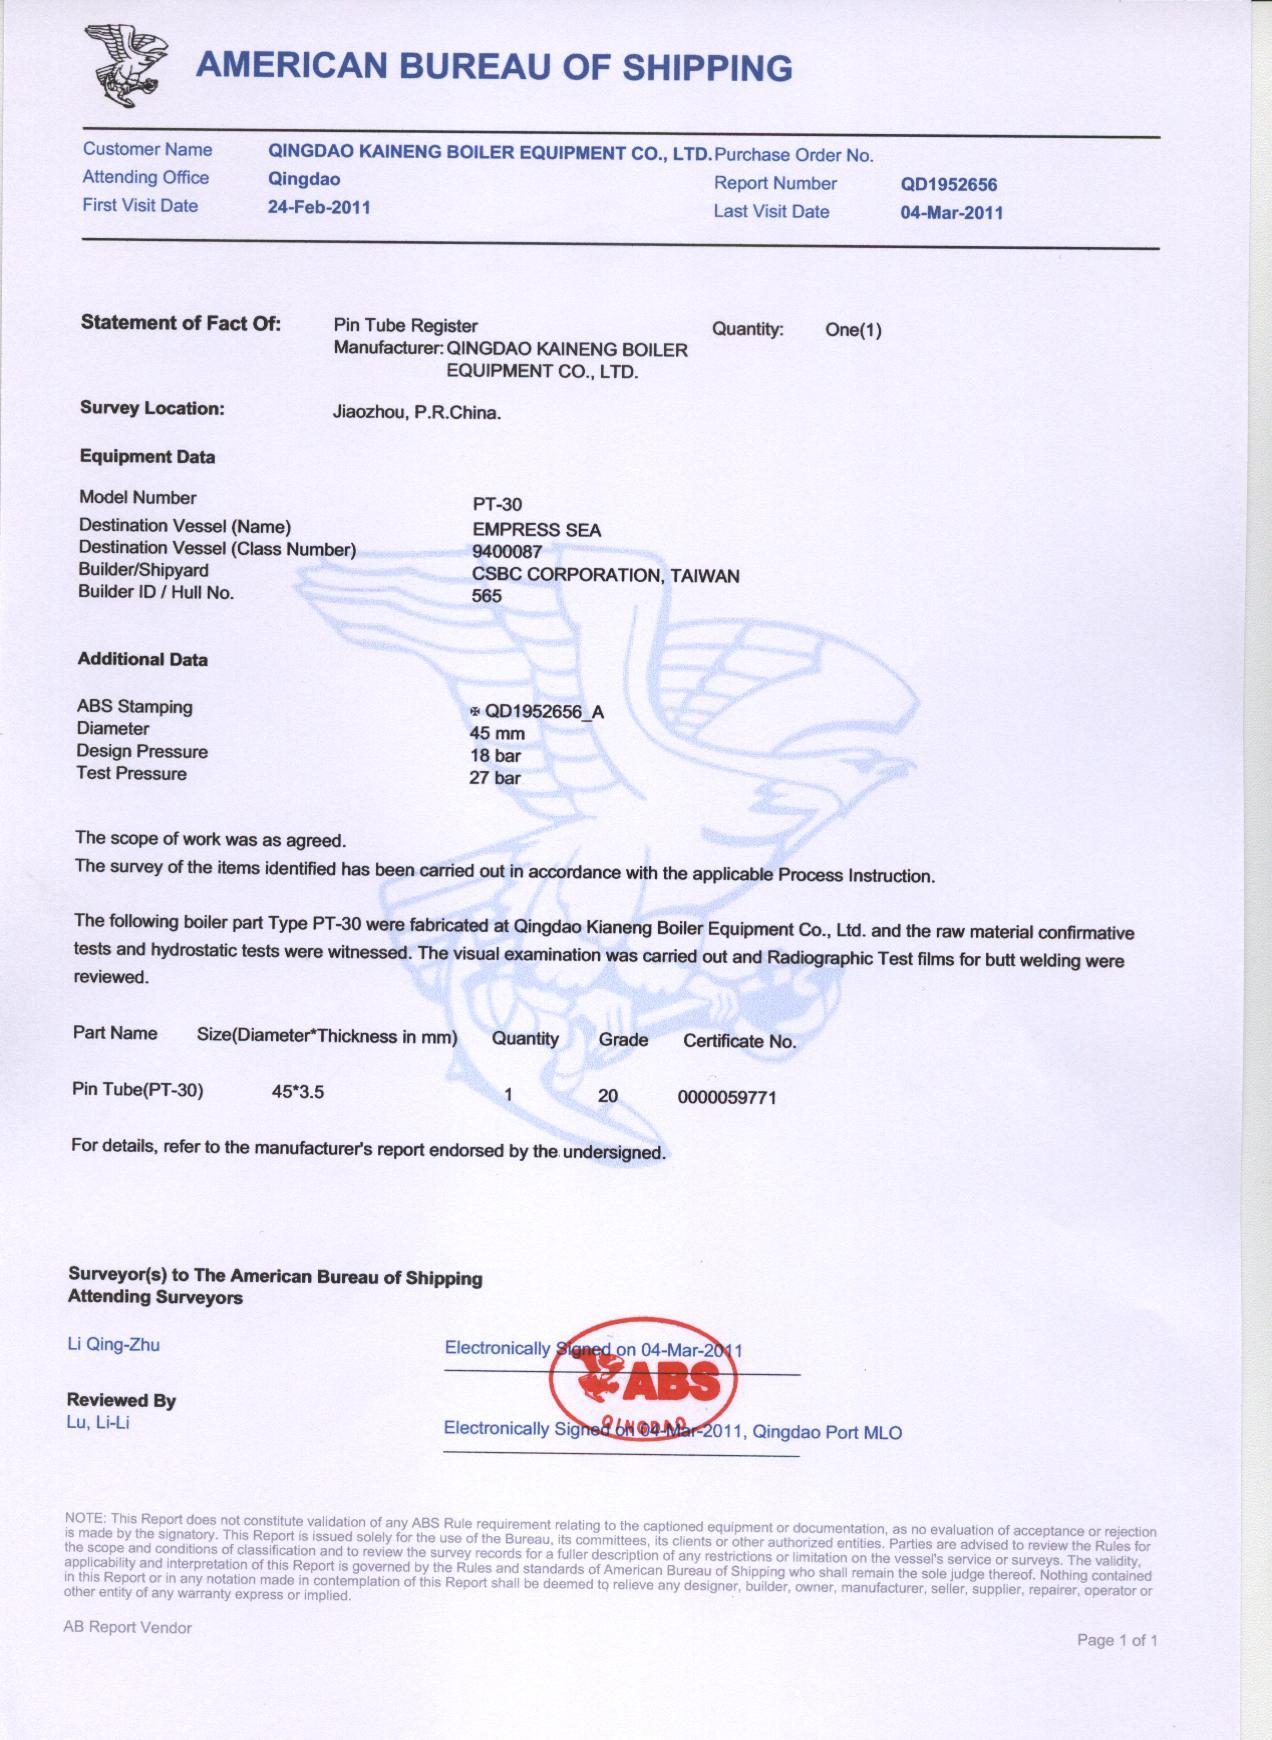 ABS船级社认可证书